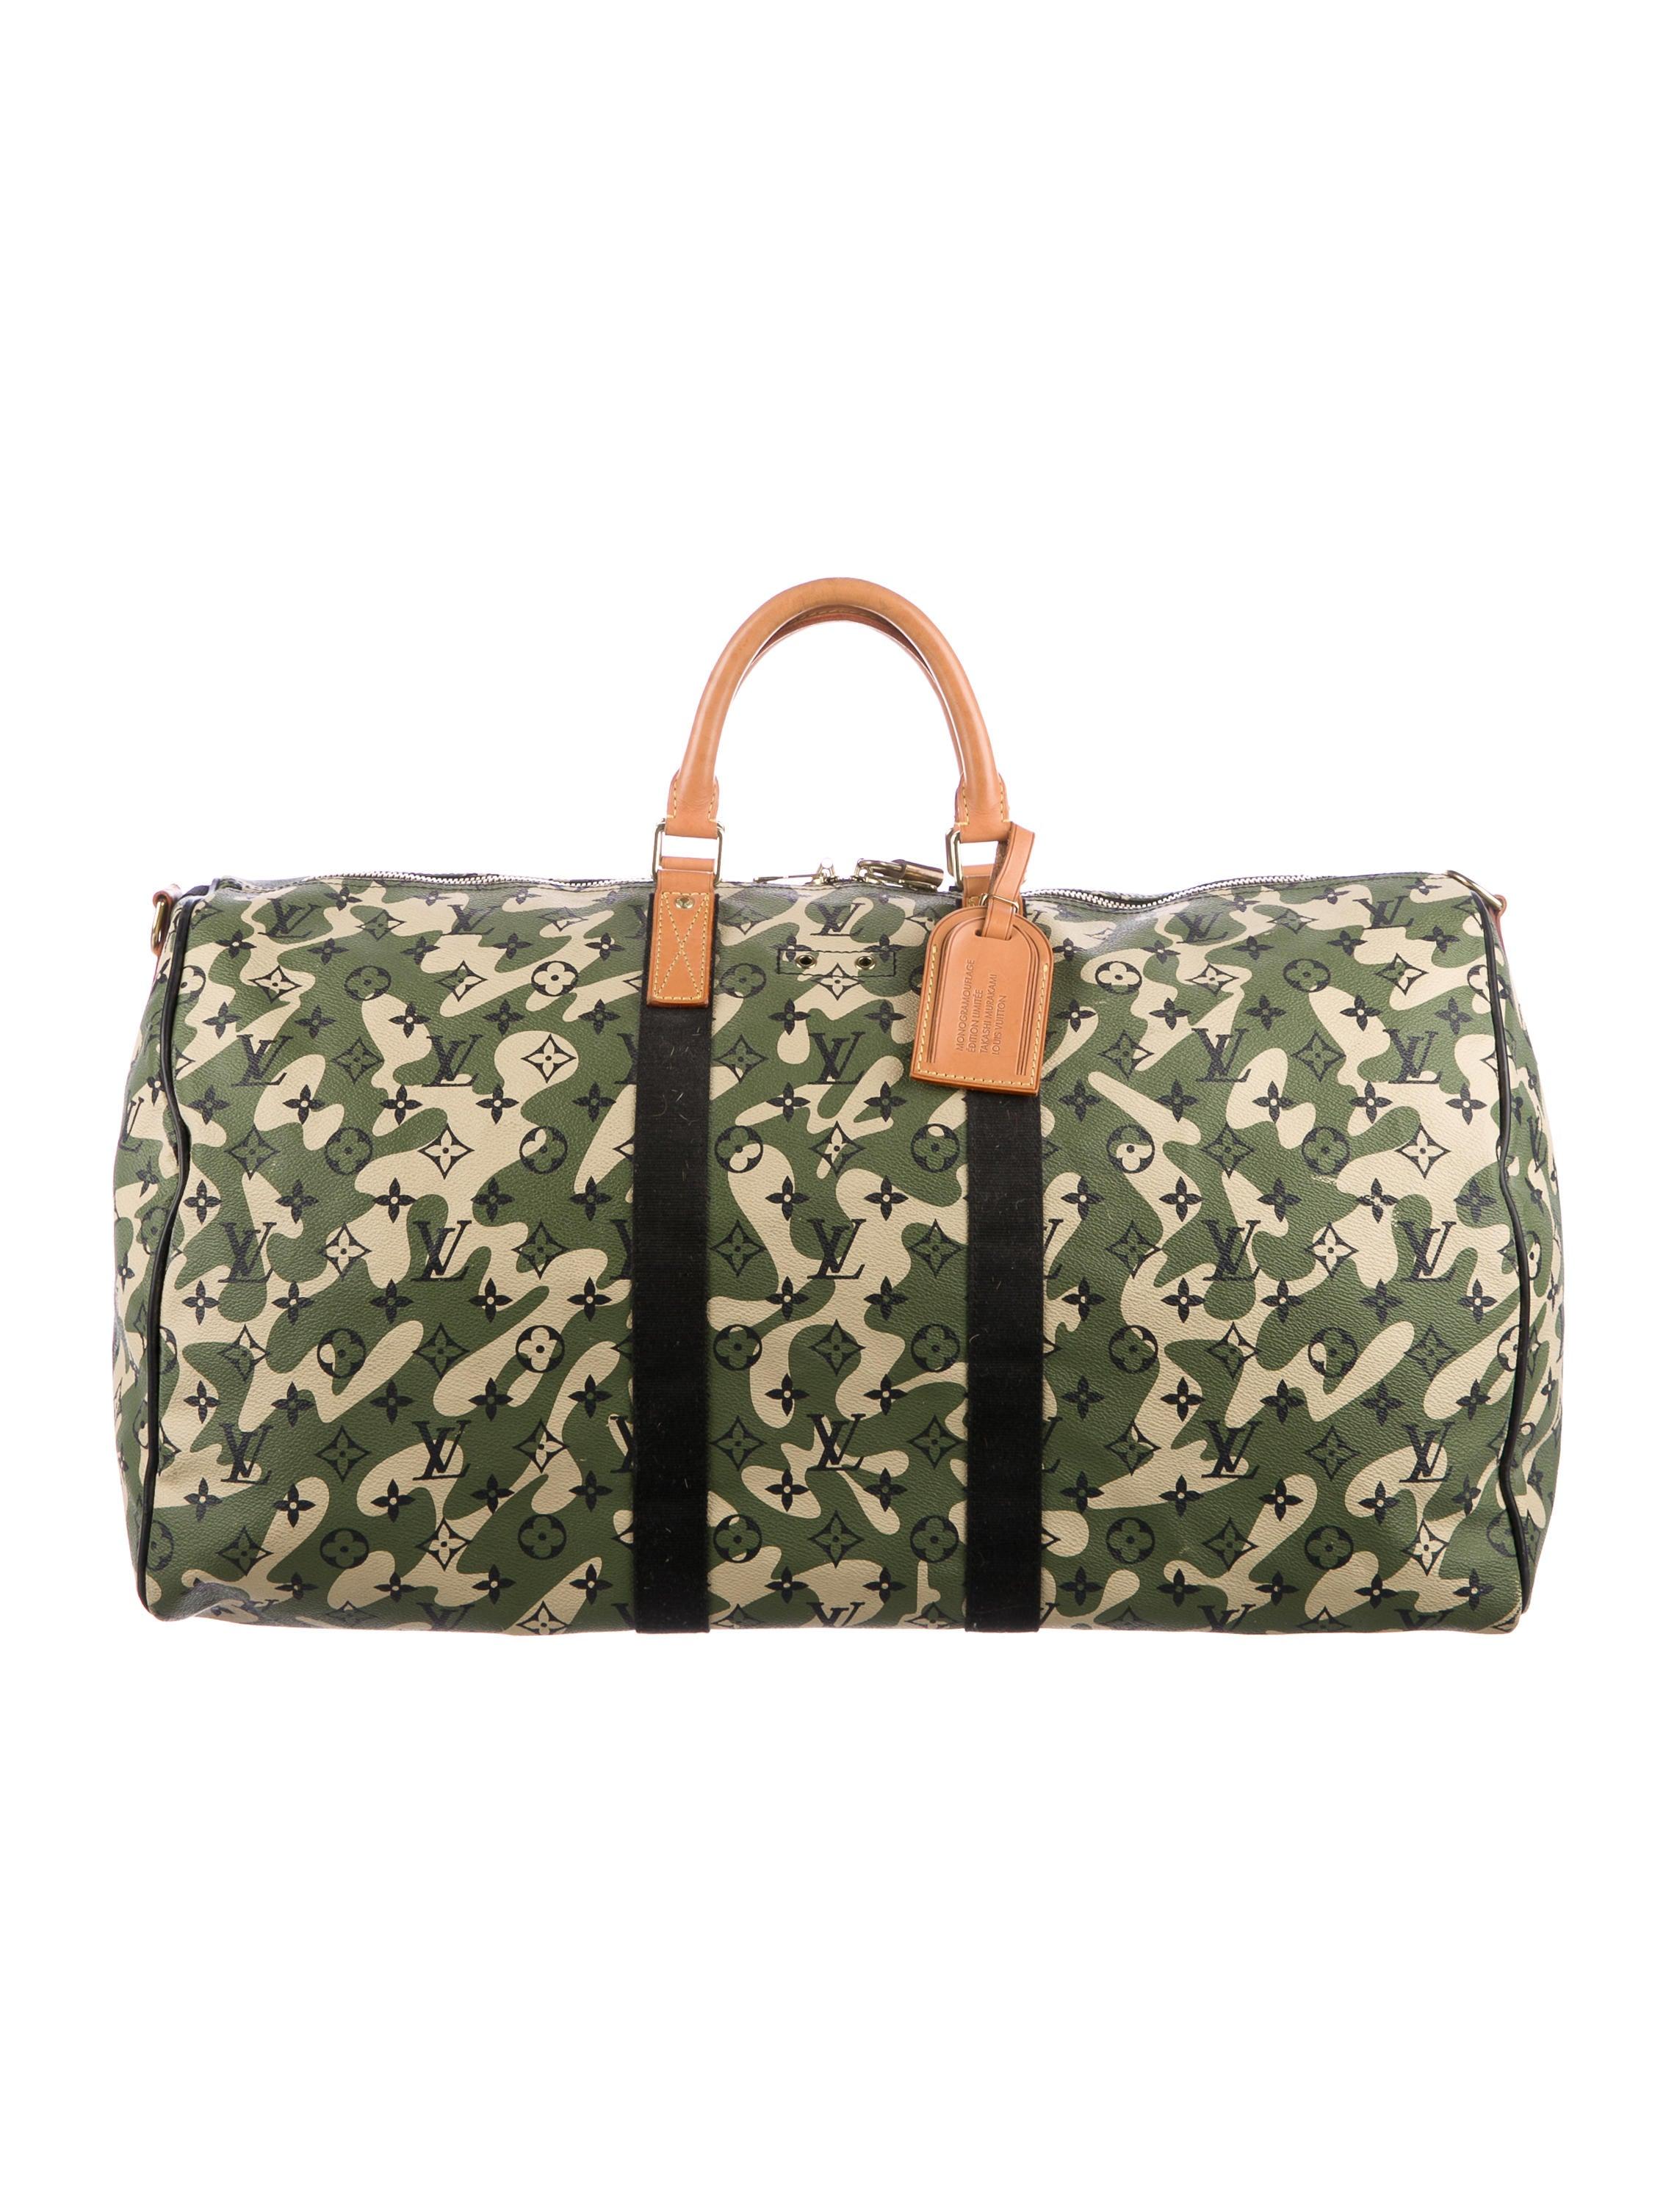 9a7ab40587dc Louis Vuitton Monogramouflage Keepall Bandoulière 55 - Bags ...